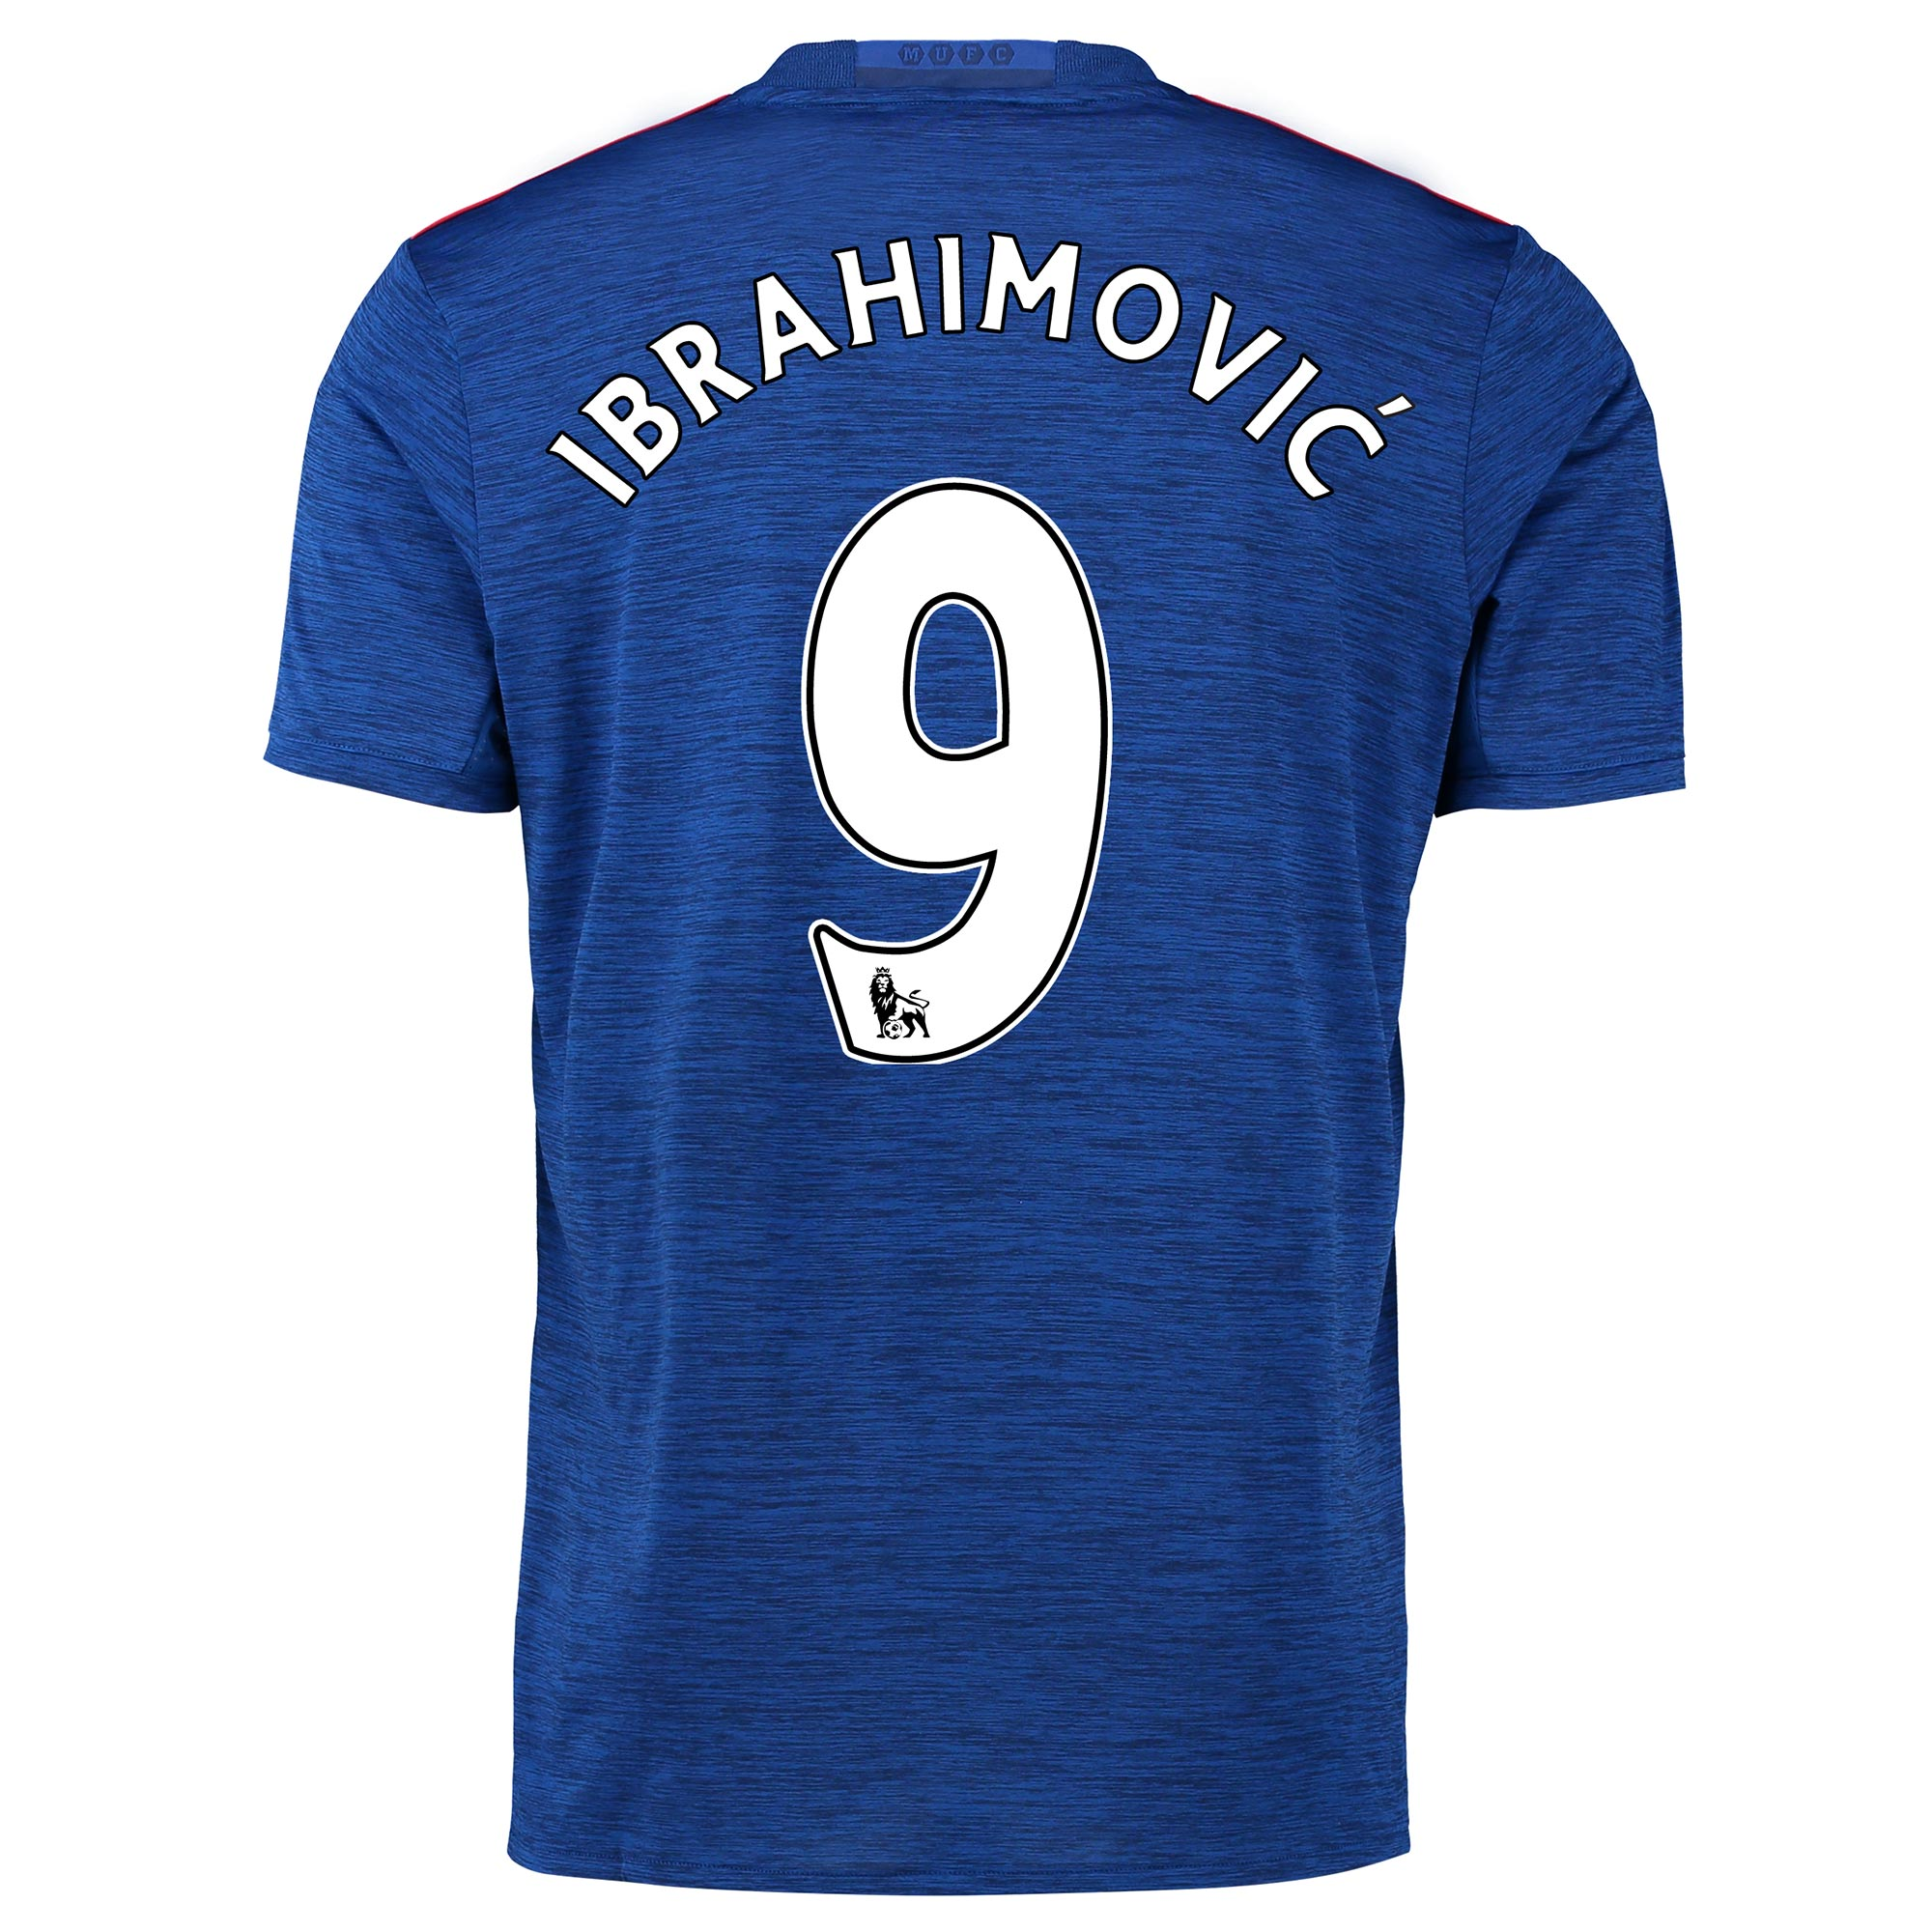 Manchester United Away Shirt 2016-17 with Ibrahimovic 9 printing, Blue